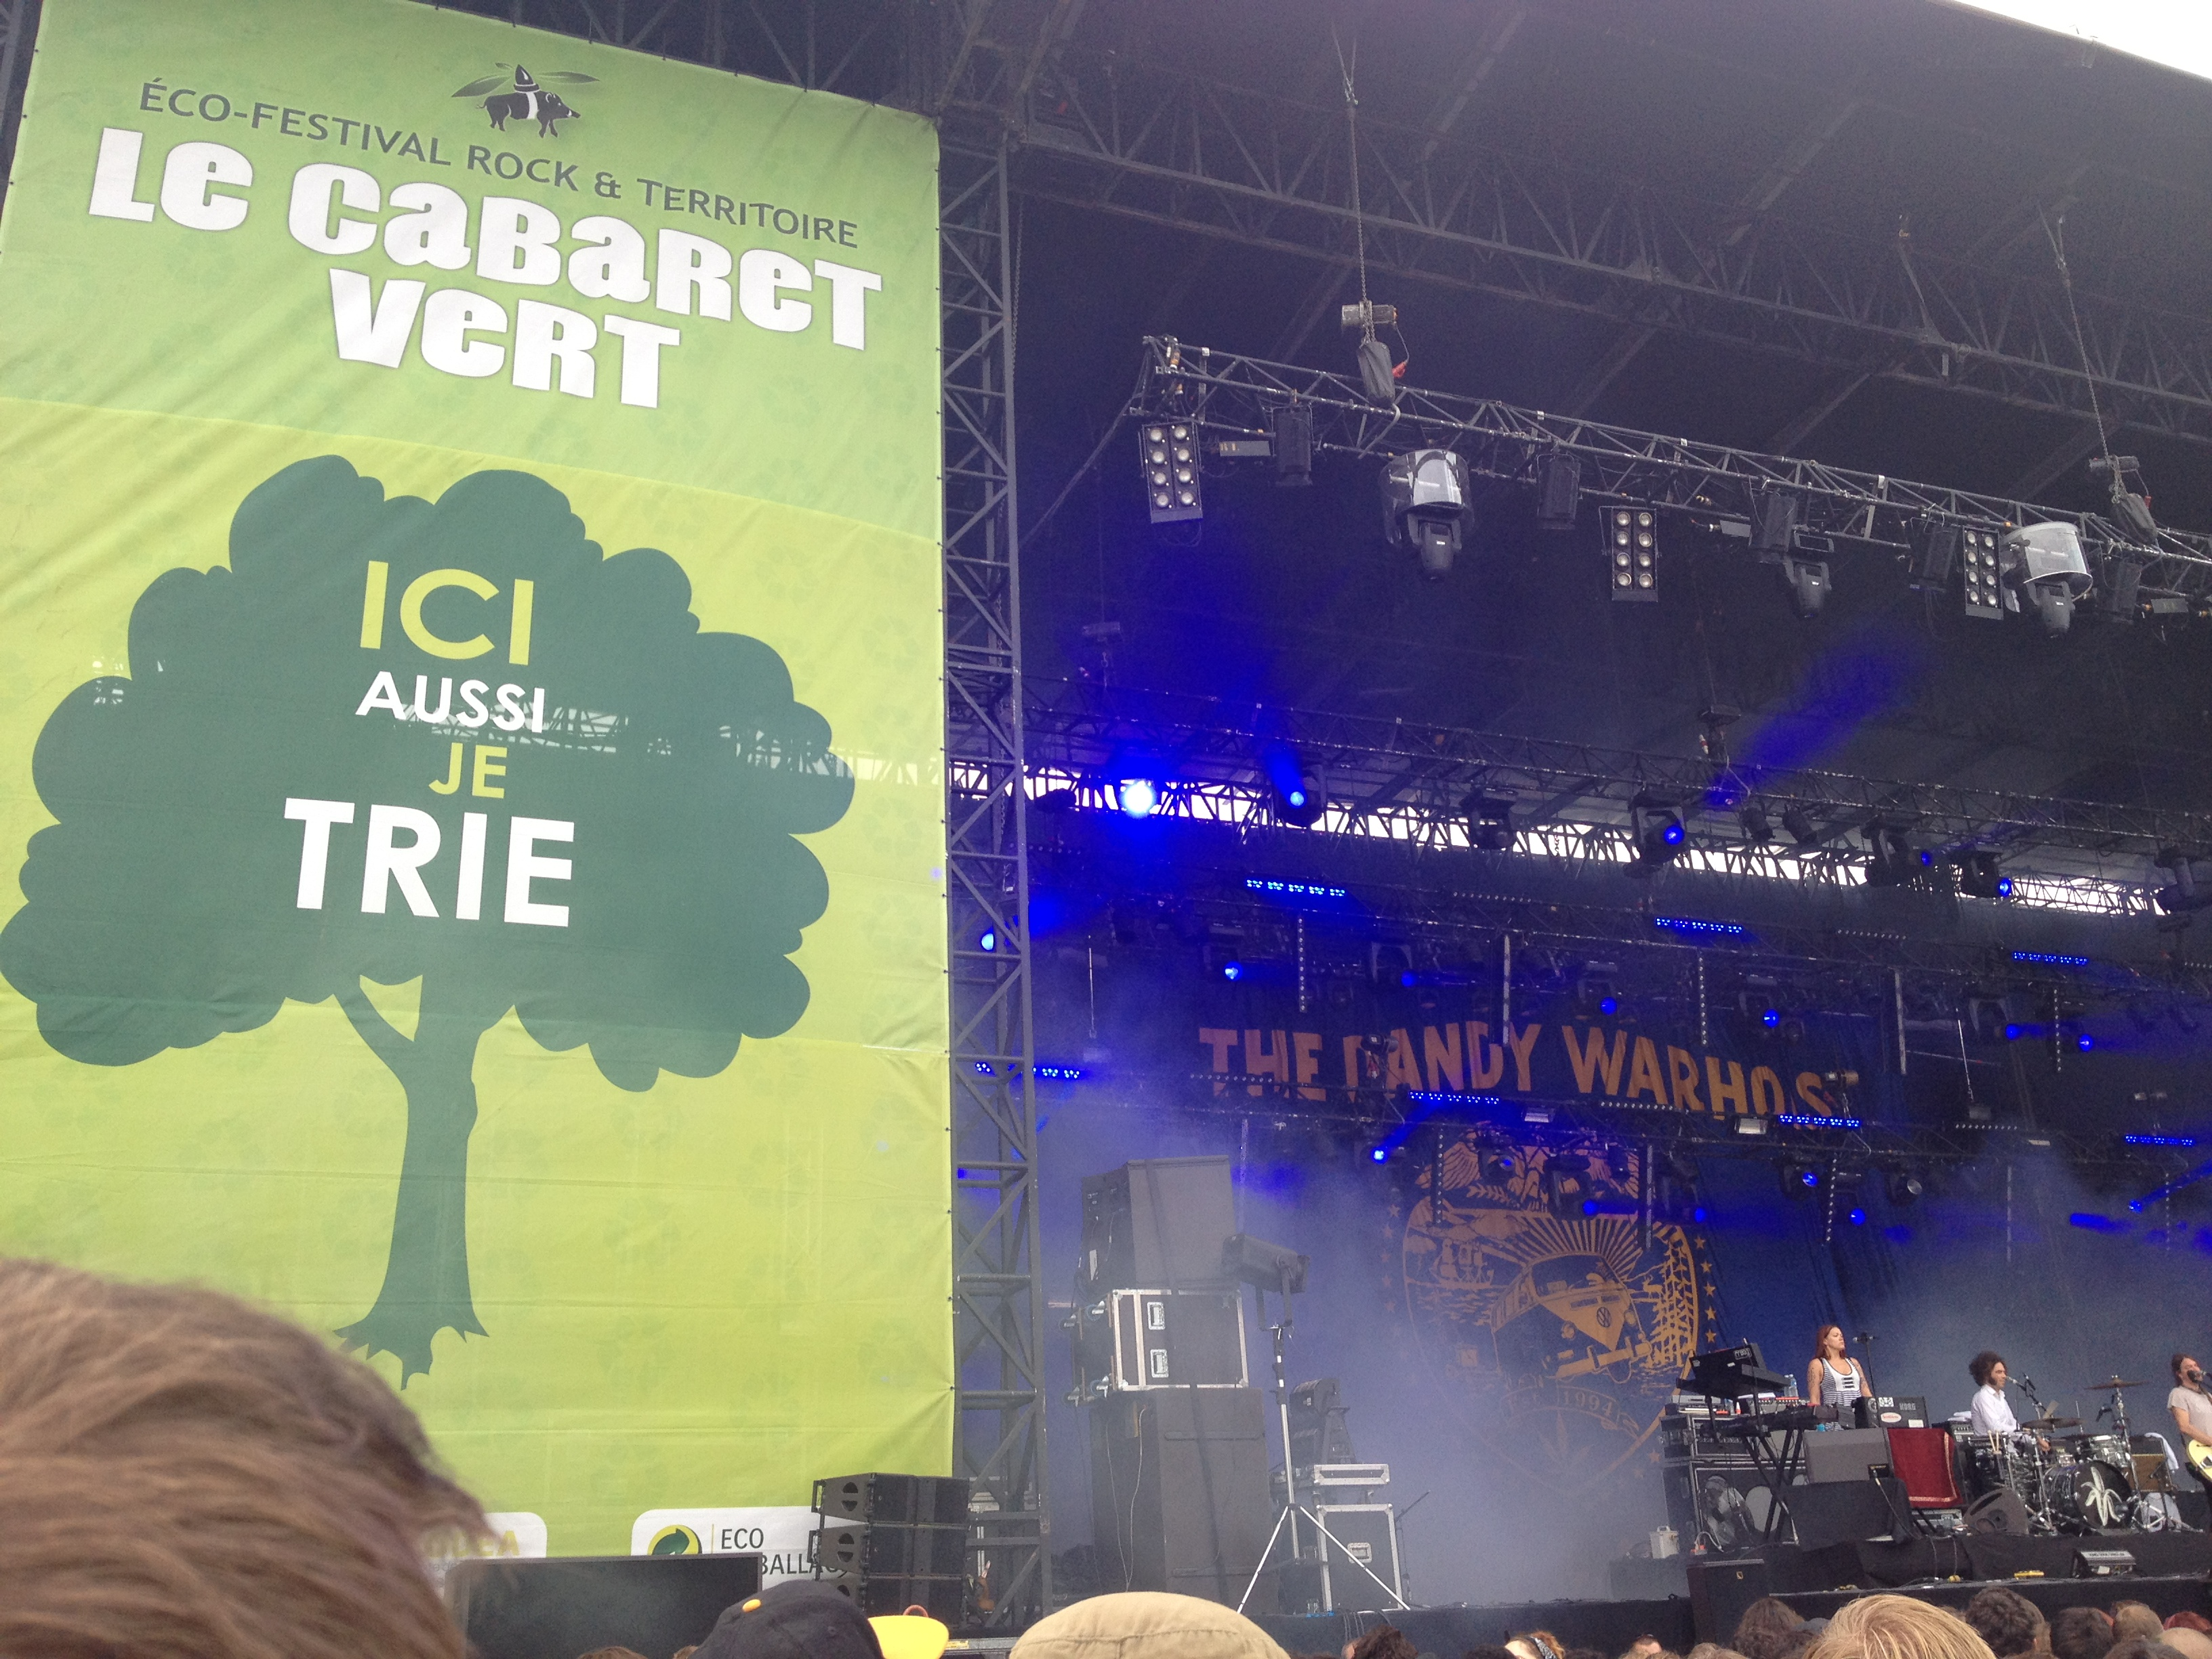 Cabaret-vert-2012-Dandy-Warhols.jpg